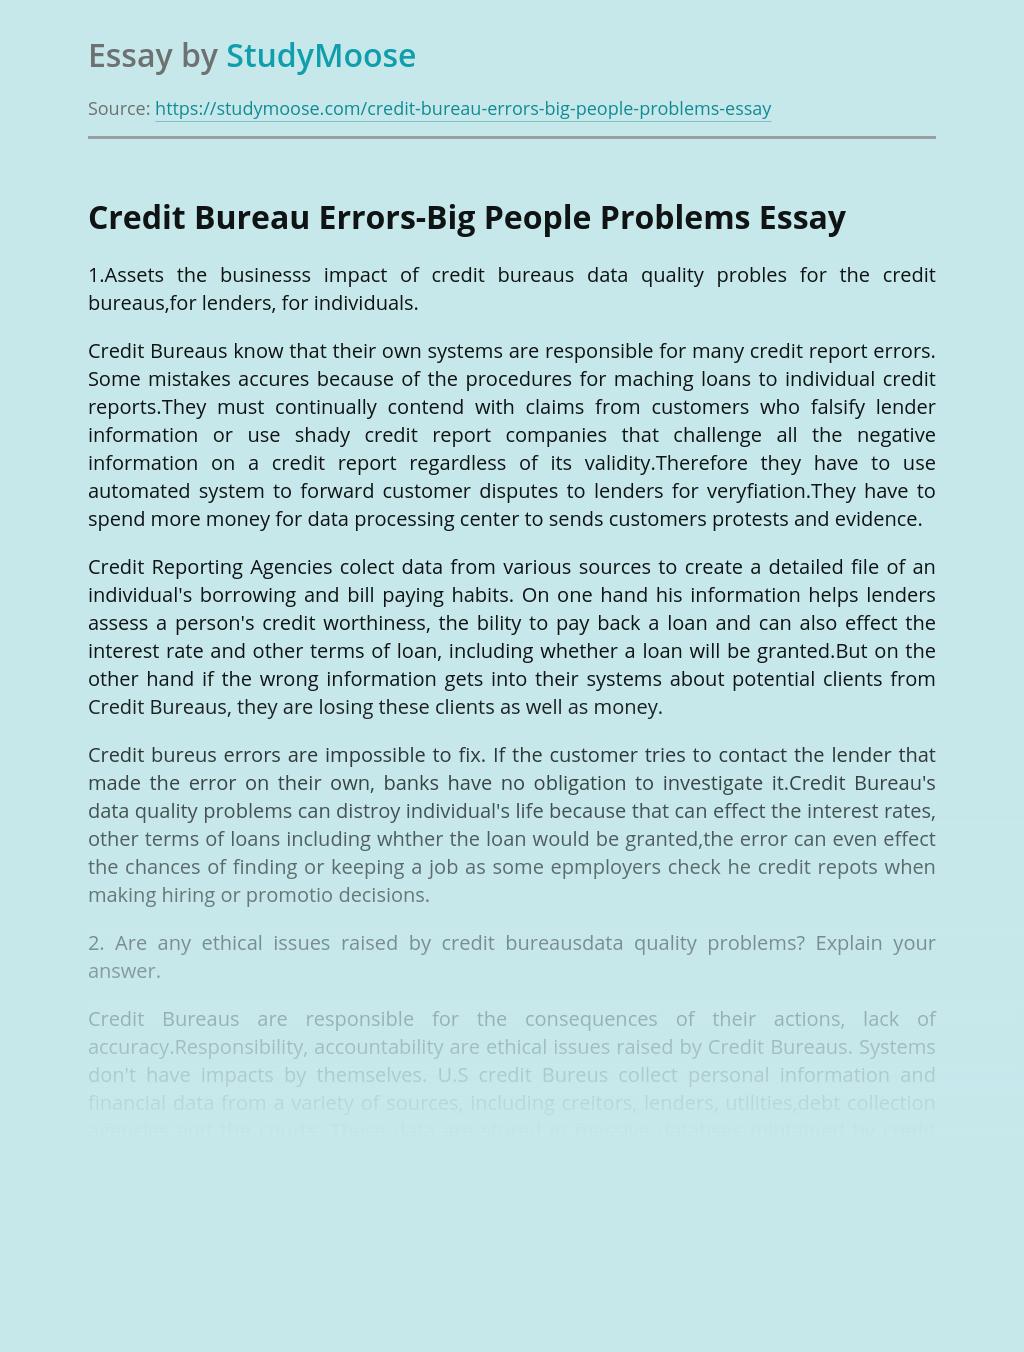 Credit Bureau Errors-Big People Problems